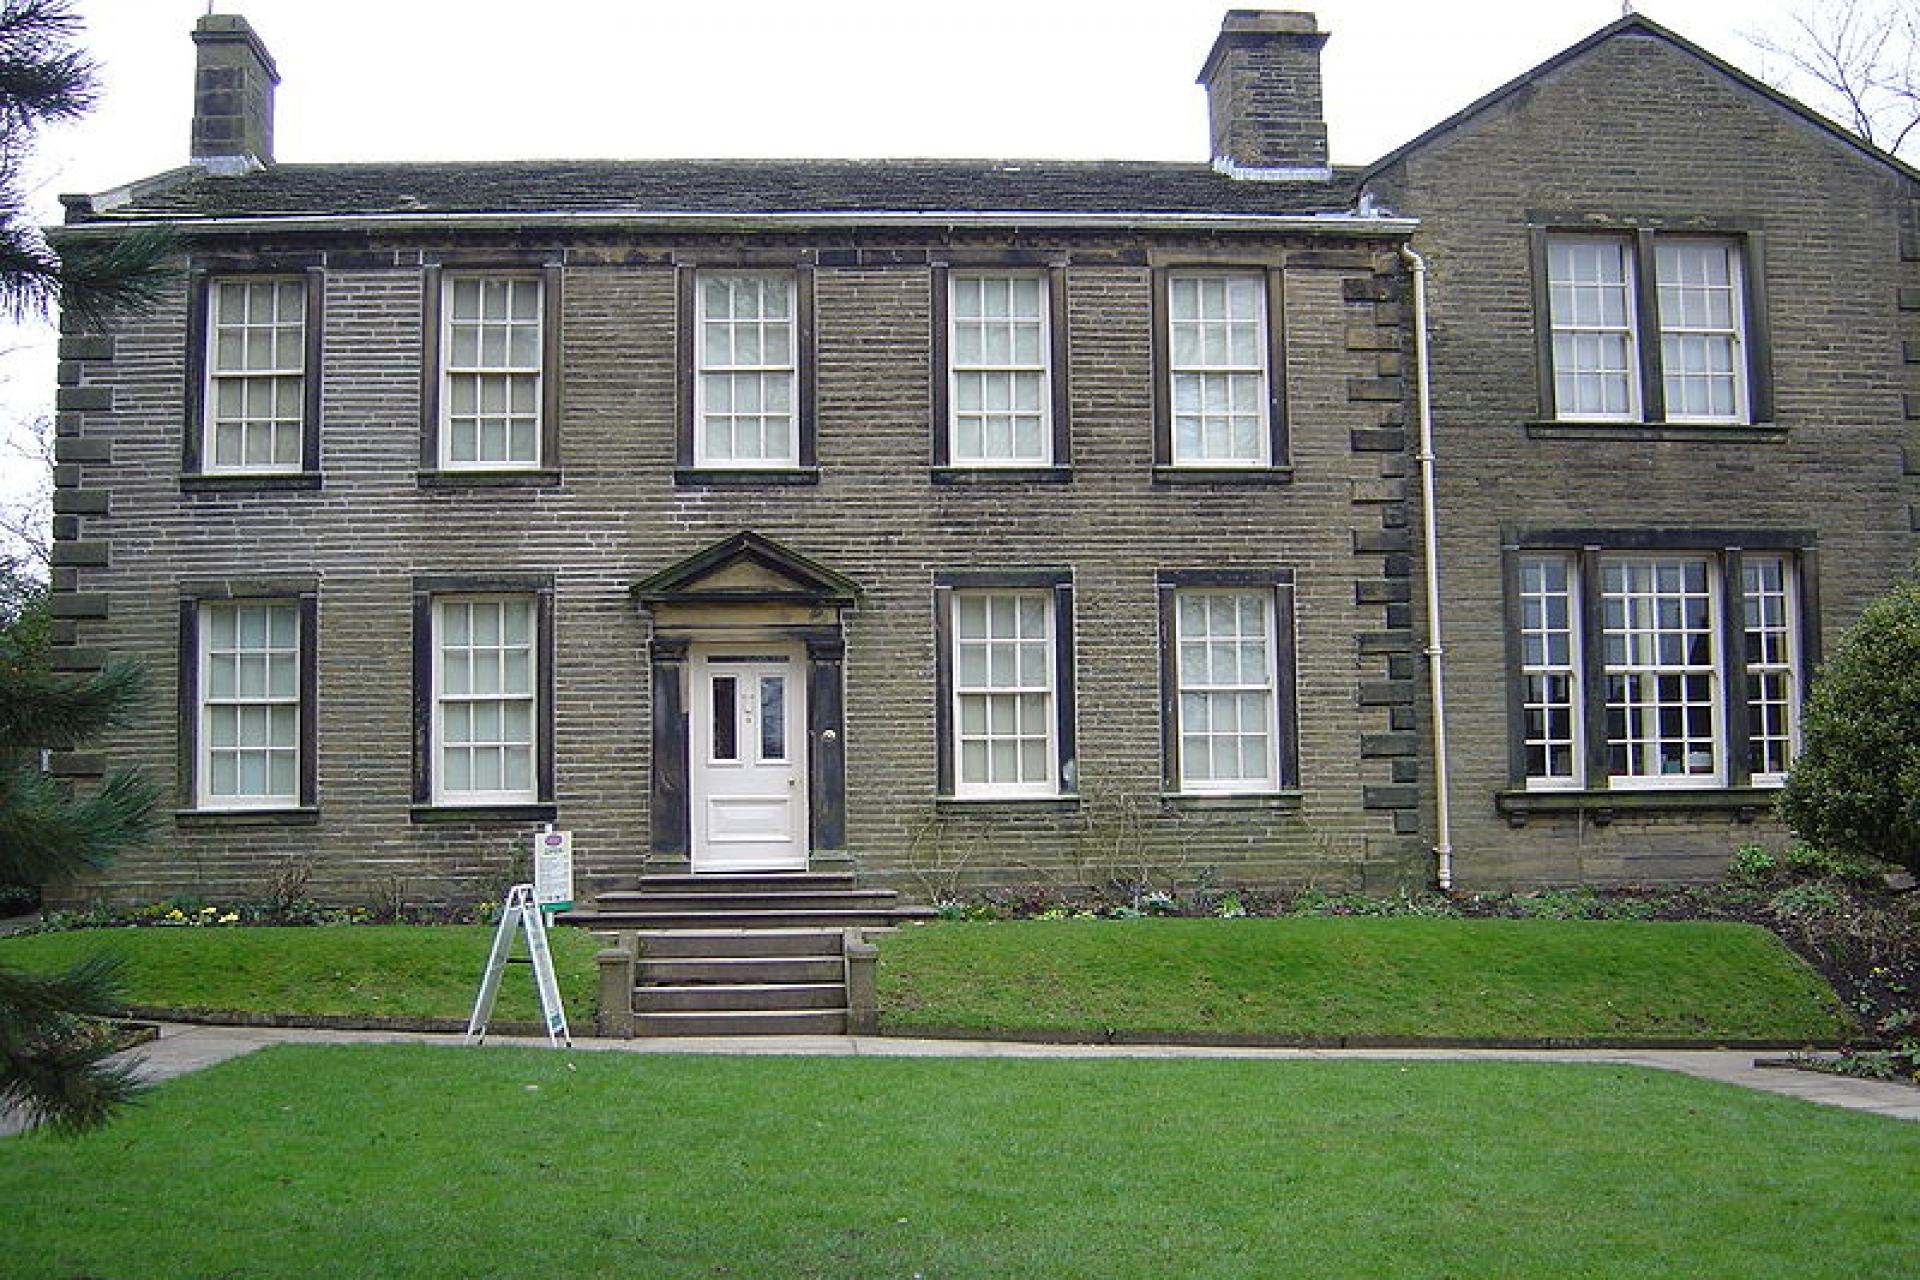 Emily Brontë's 200th Birthday